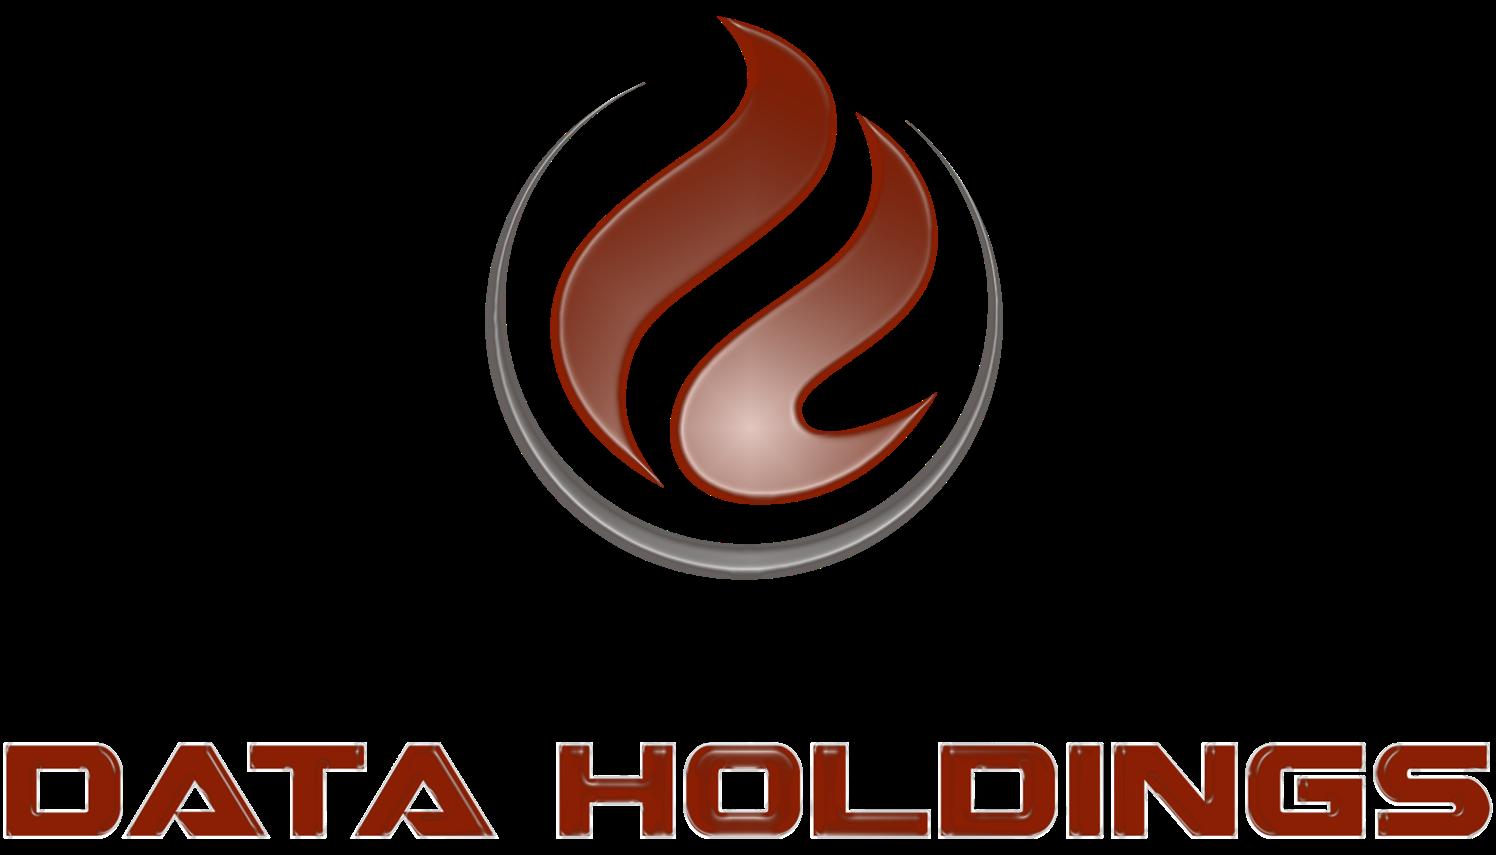 Tier III+ Standards — Data Holdings Data Center - Milwaukee, WI